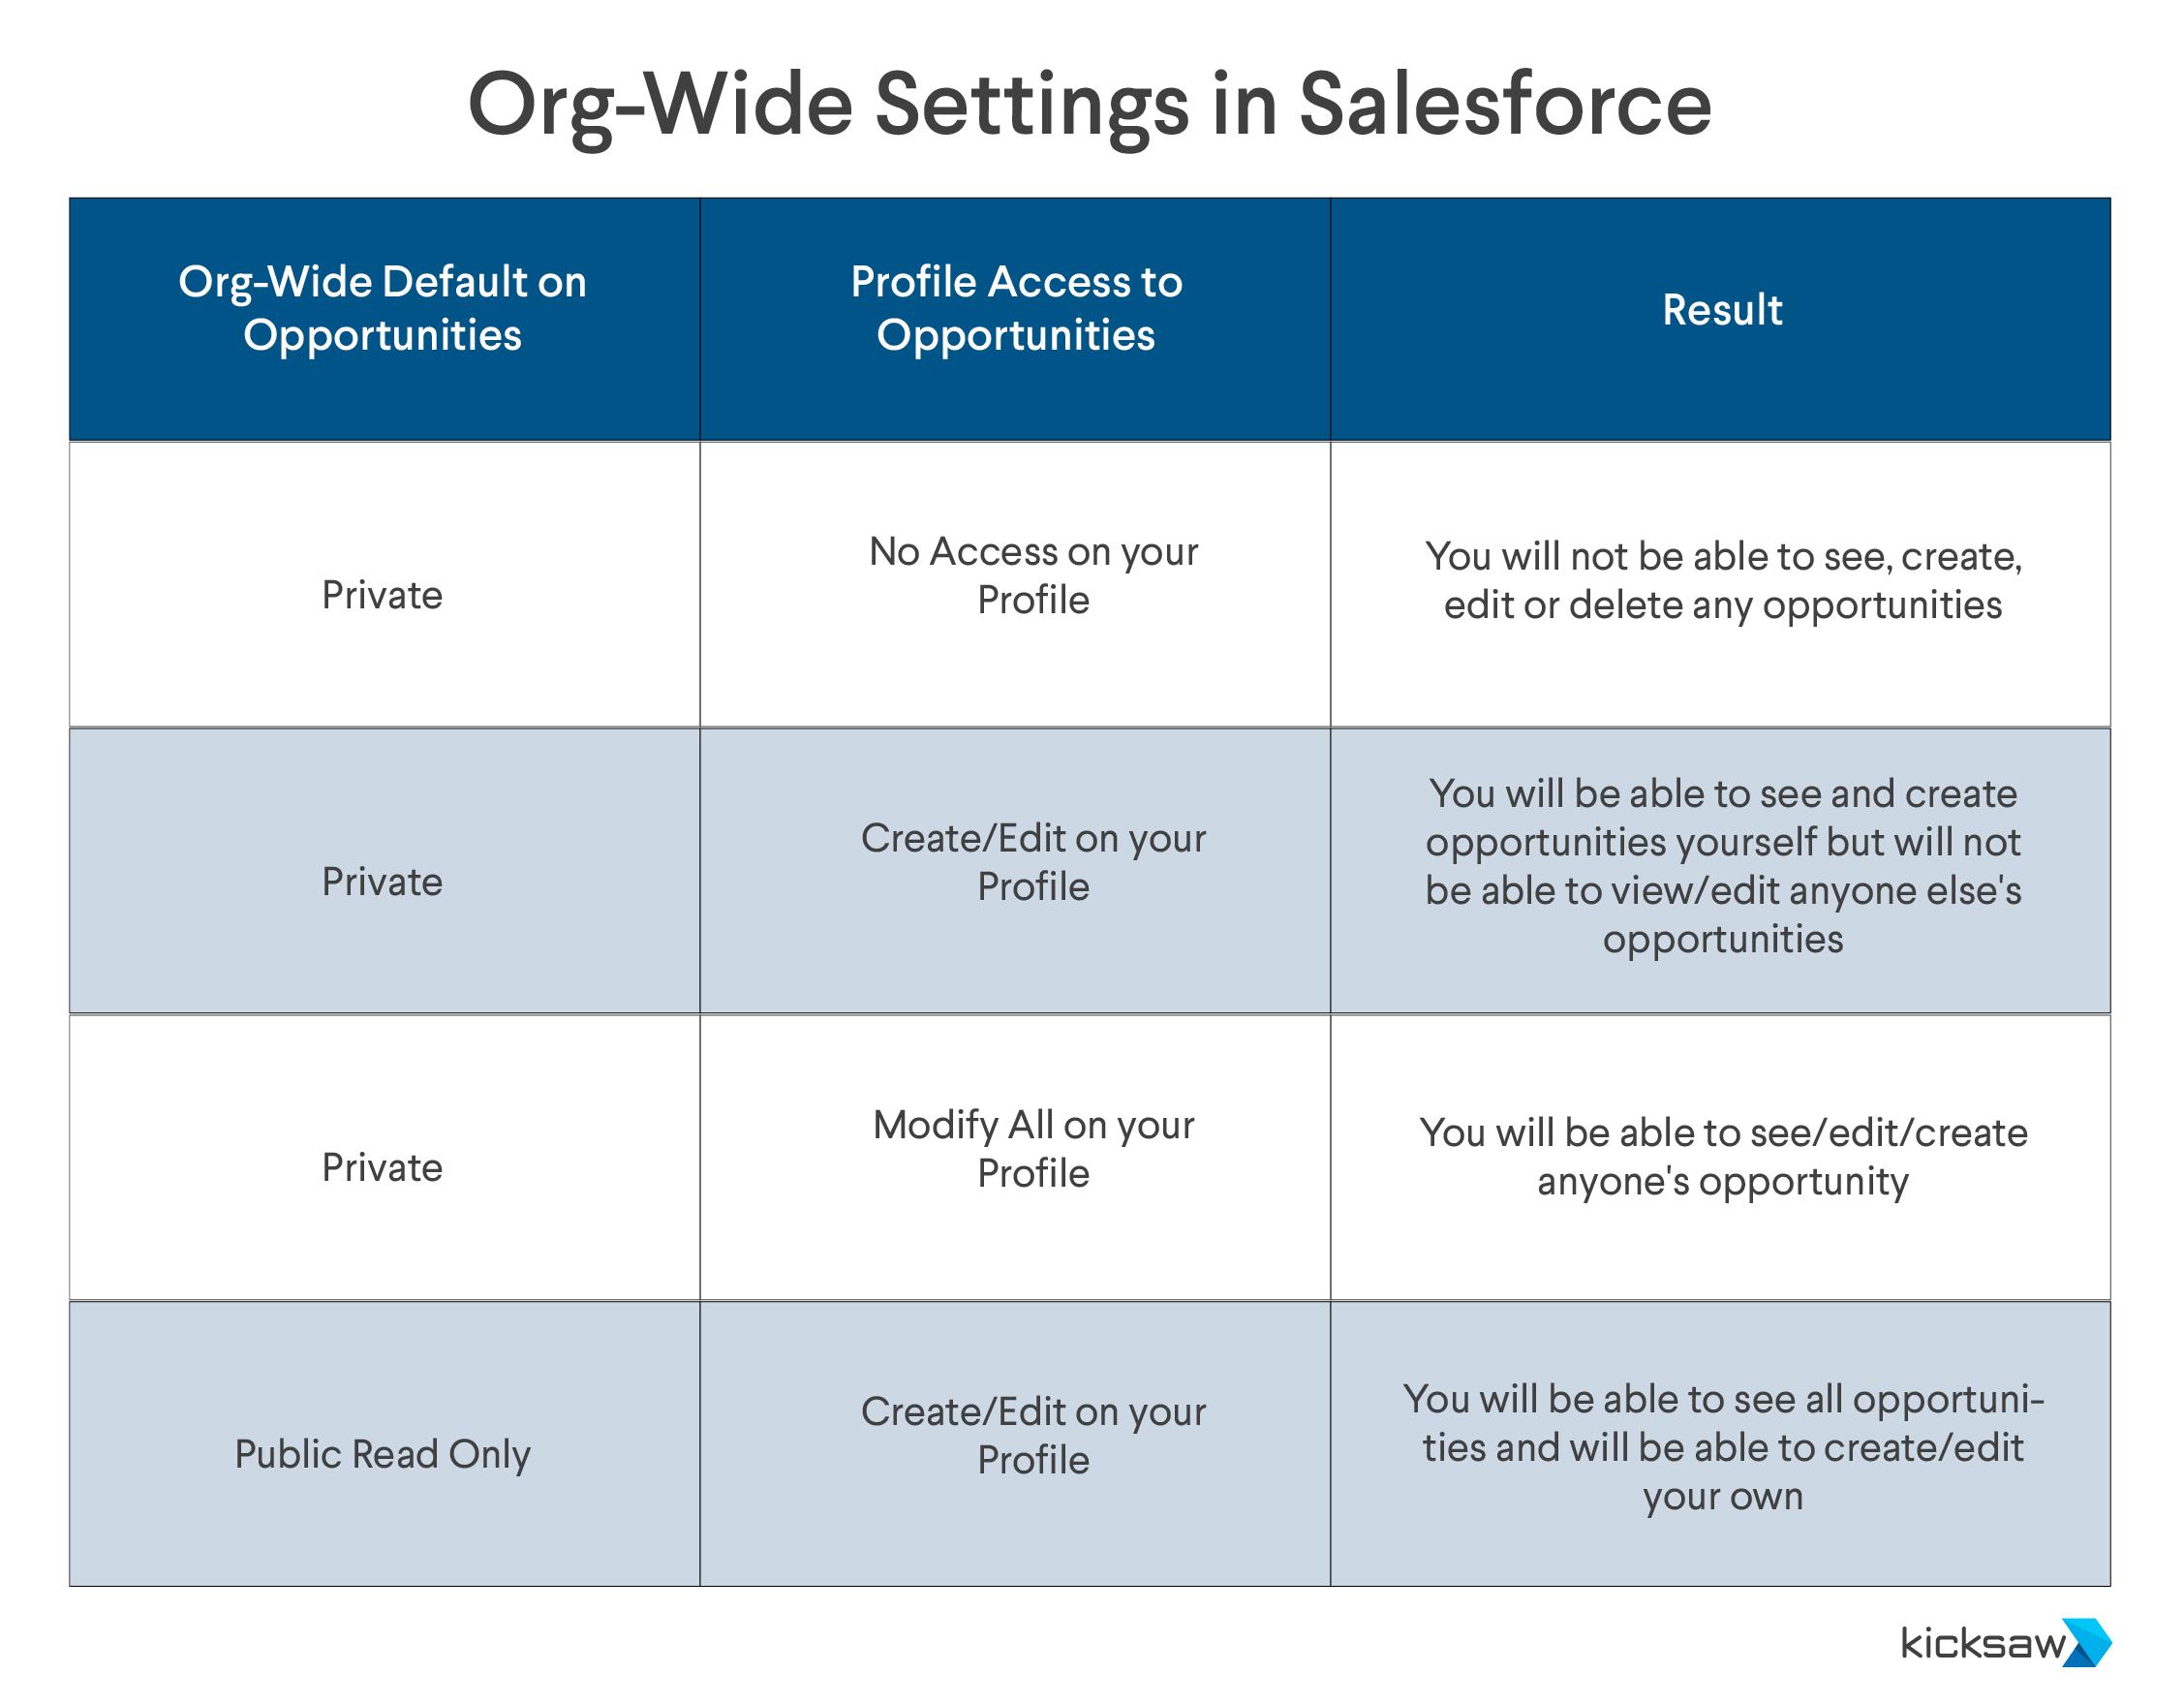 Org-wide-settings-in-salesforce